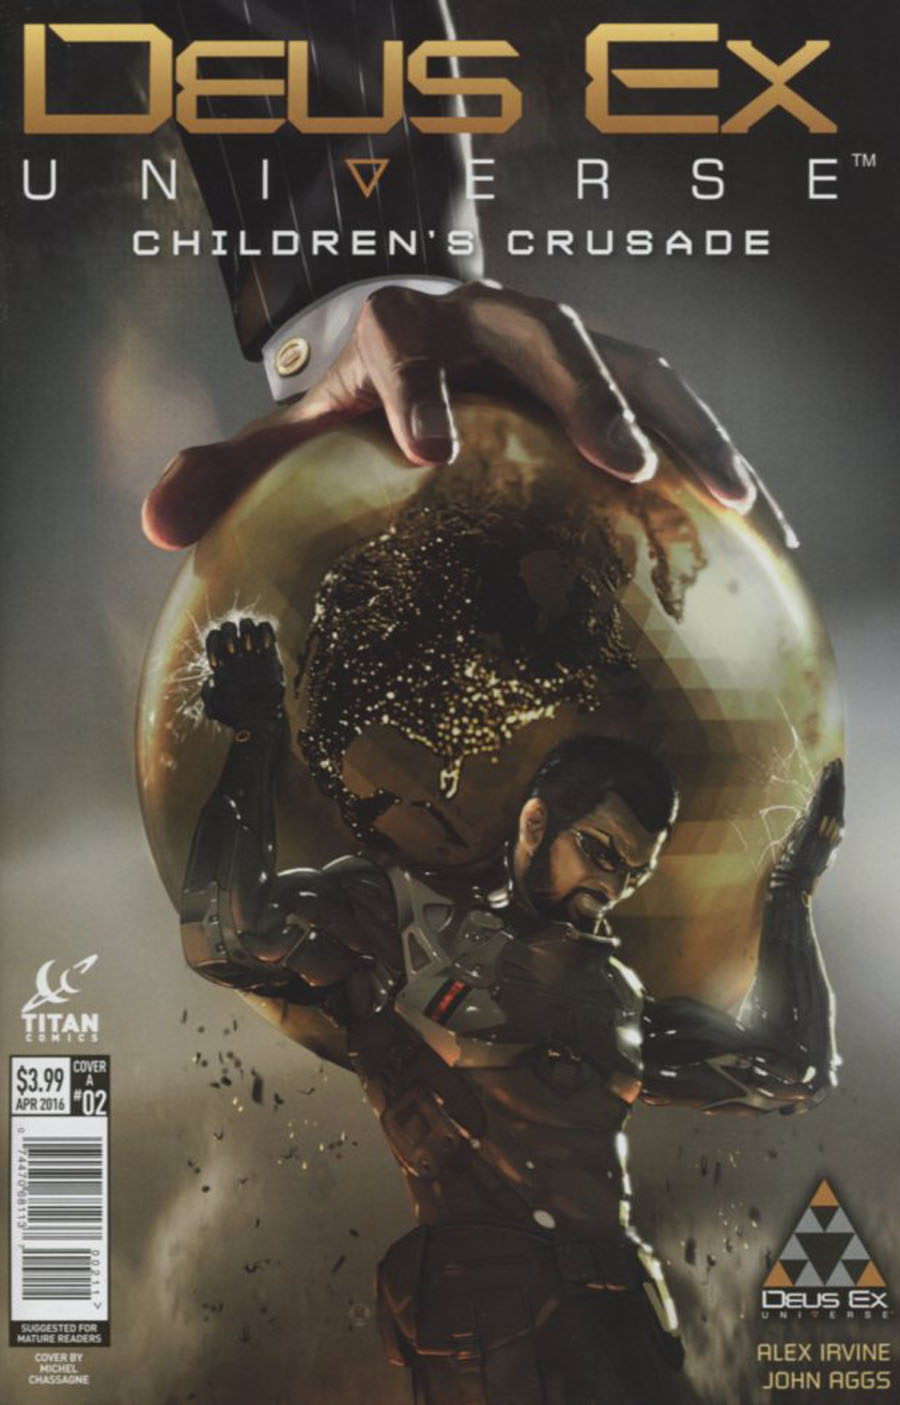 Deus Ex Universe Childrens Crusade #2 Cover A Regular Yohann Schepacz Cover